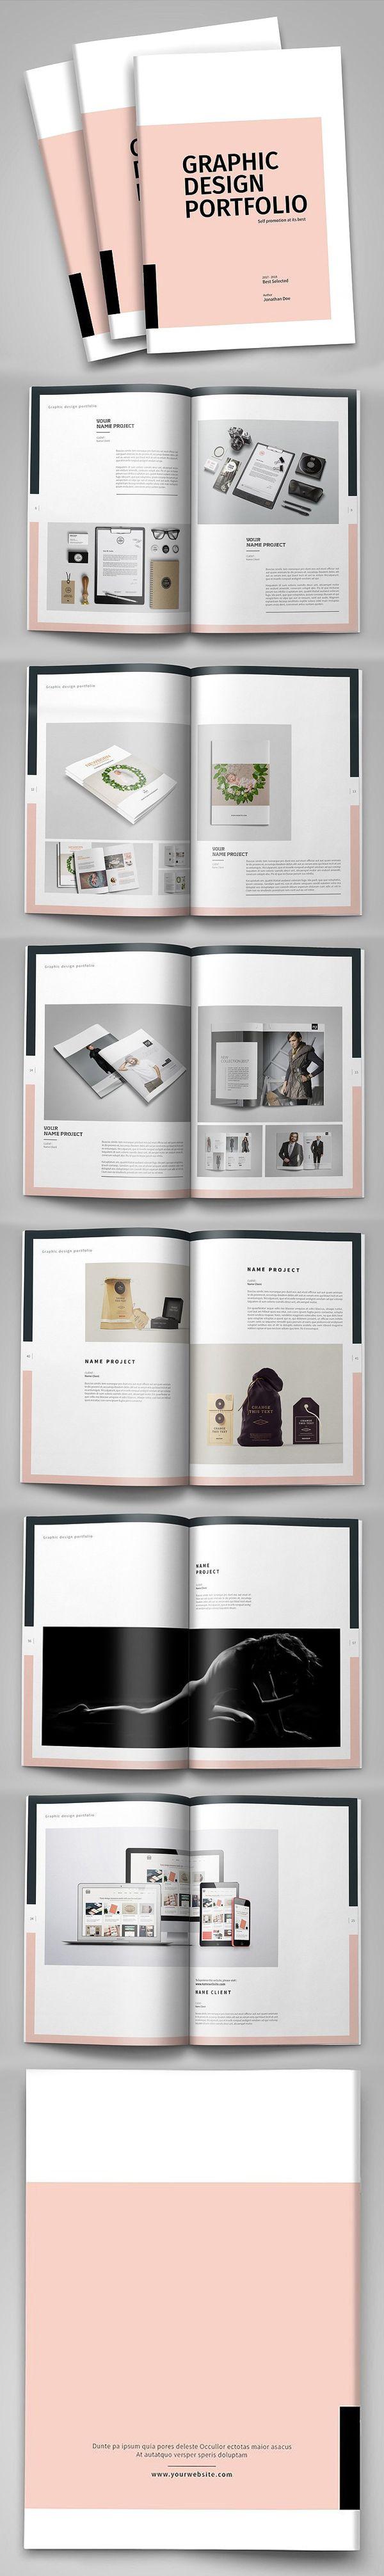 Minimal Design Portfolio Template #brochuretemplate #catalogdesign #booklet #annualreport #printdesign #psdtemplate